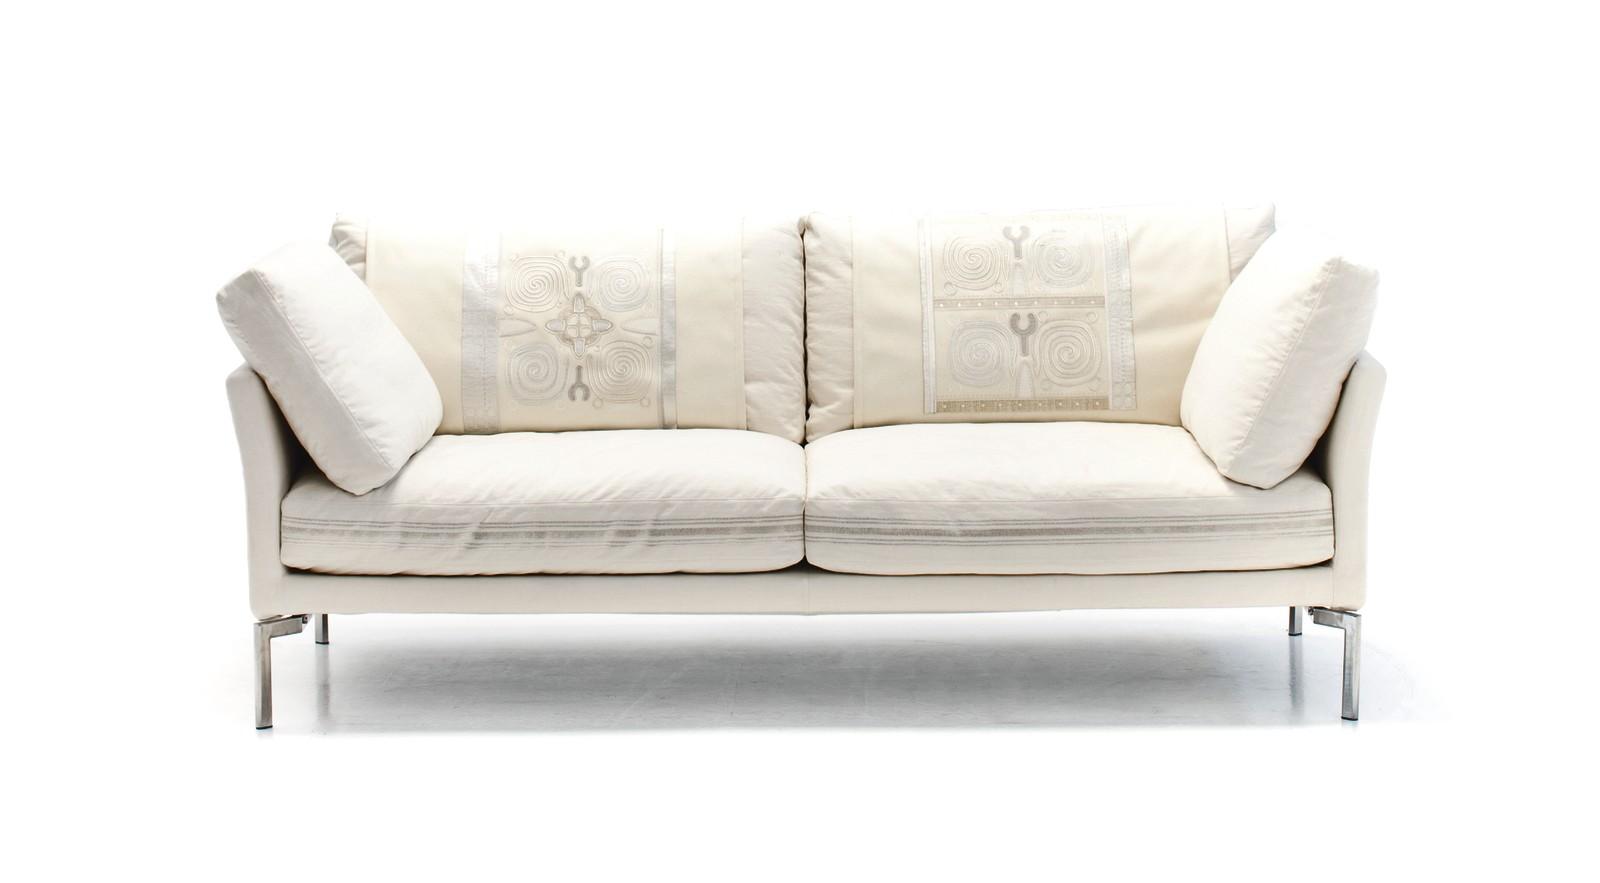 Miss Sarajevo 2 Seater Sofa A4500 - Art.48045 - 206 beige, Chrome Feet